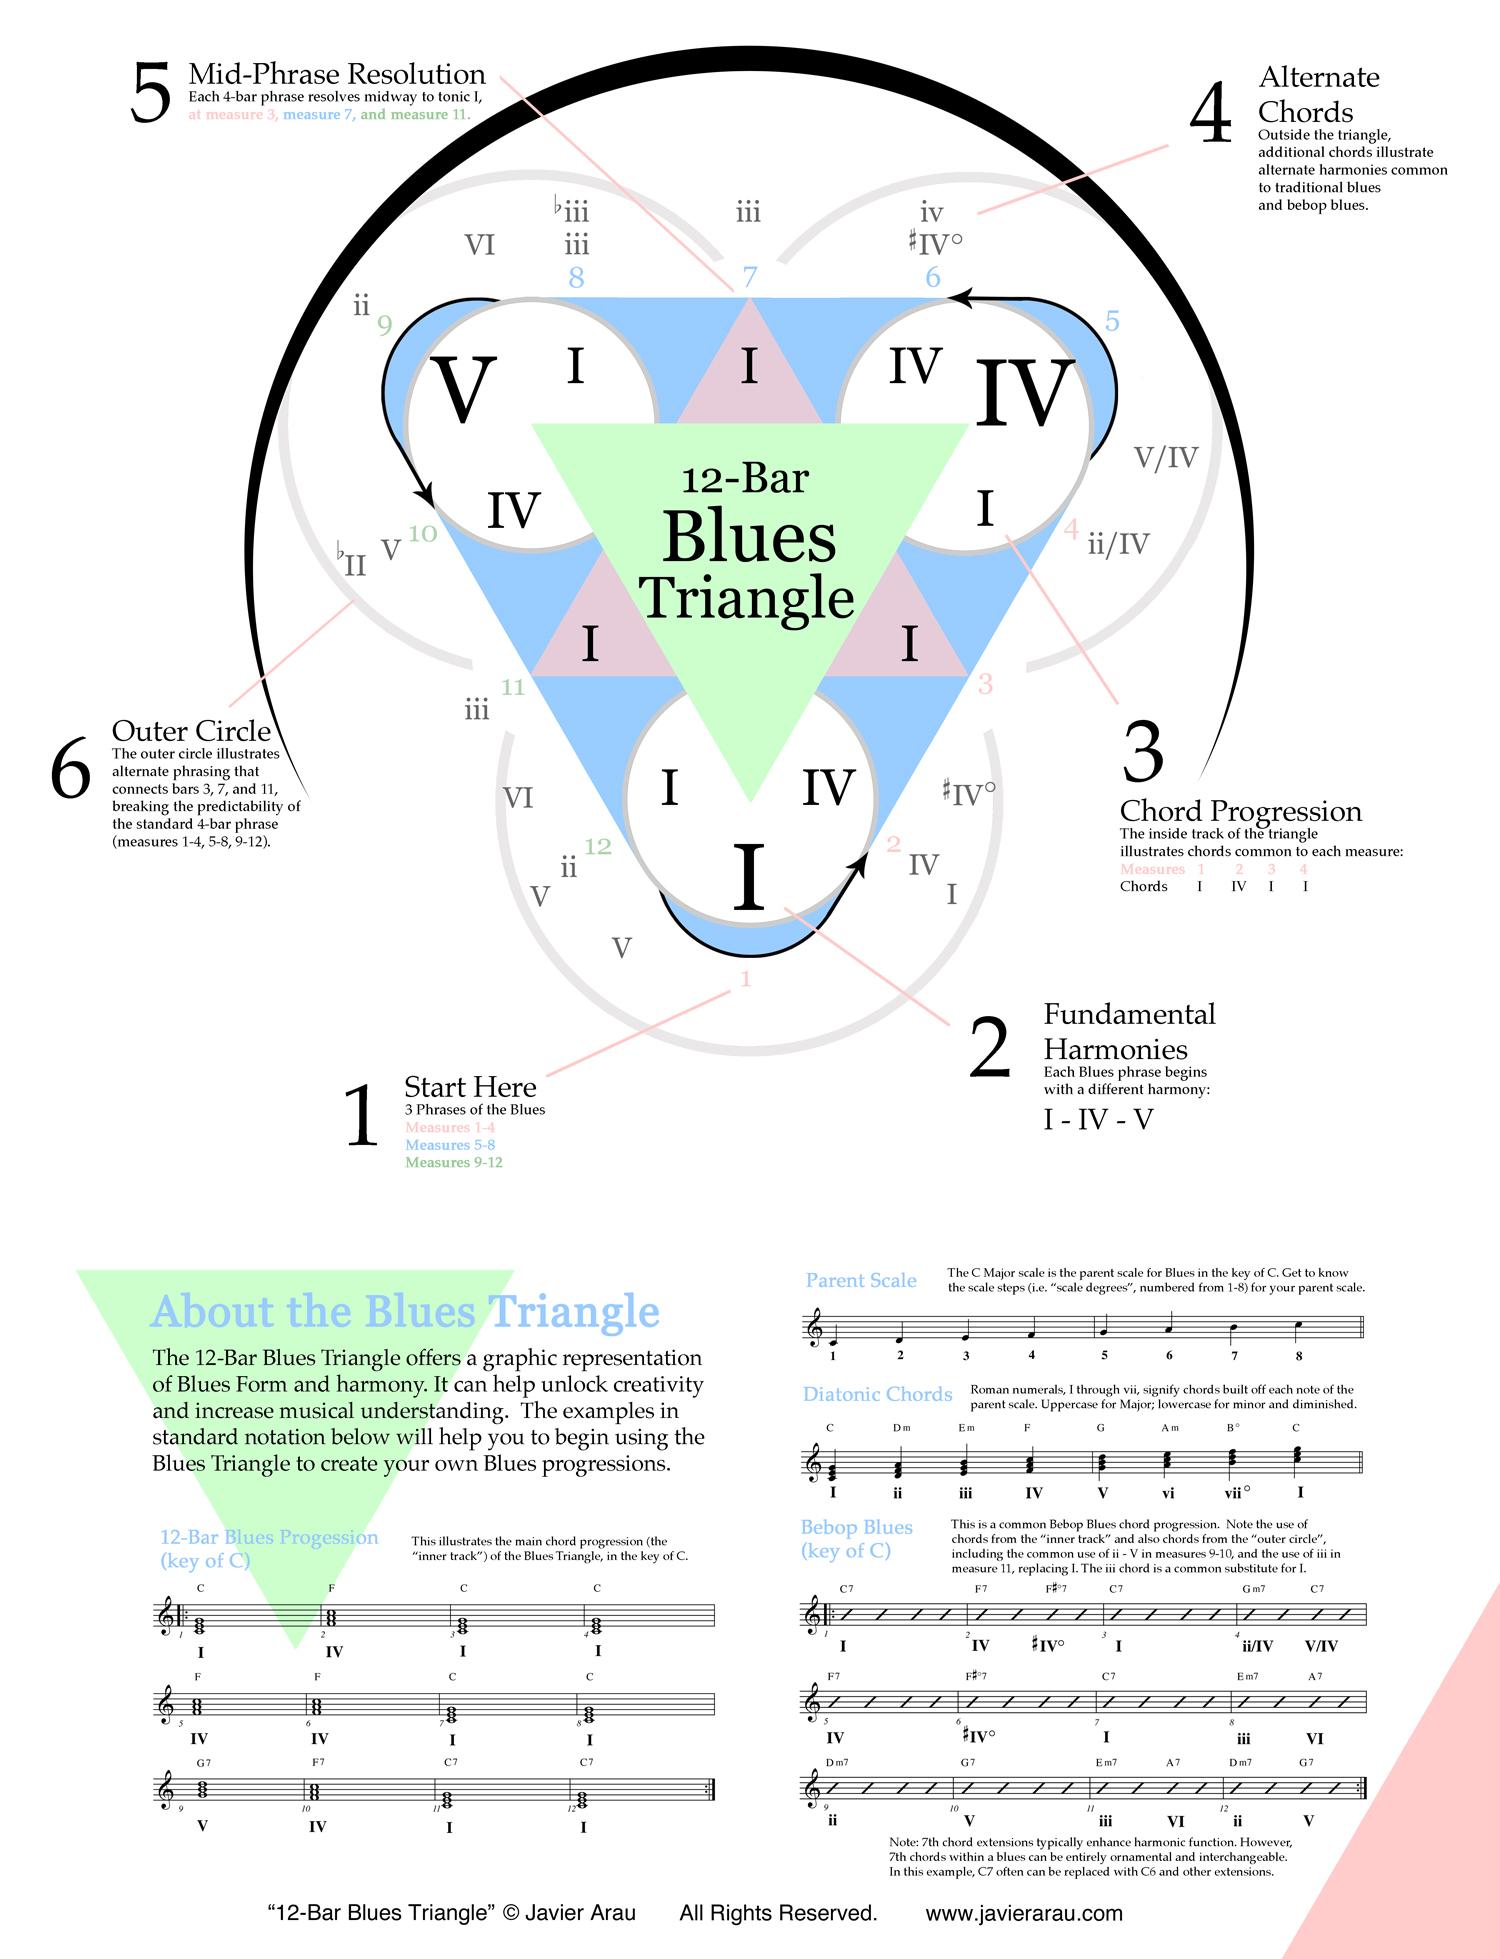 12-Bar-Blues-Triangle-Annotated-Javier-Arau-1500px.jpg